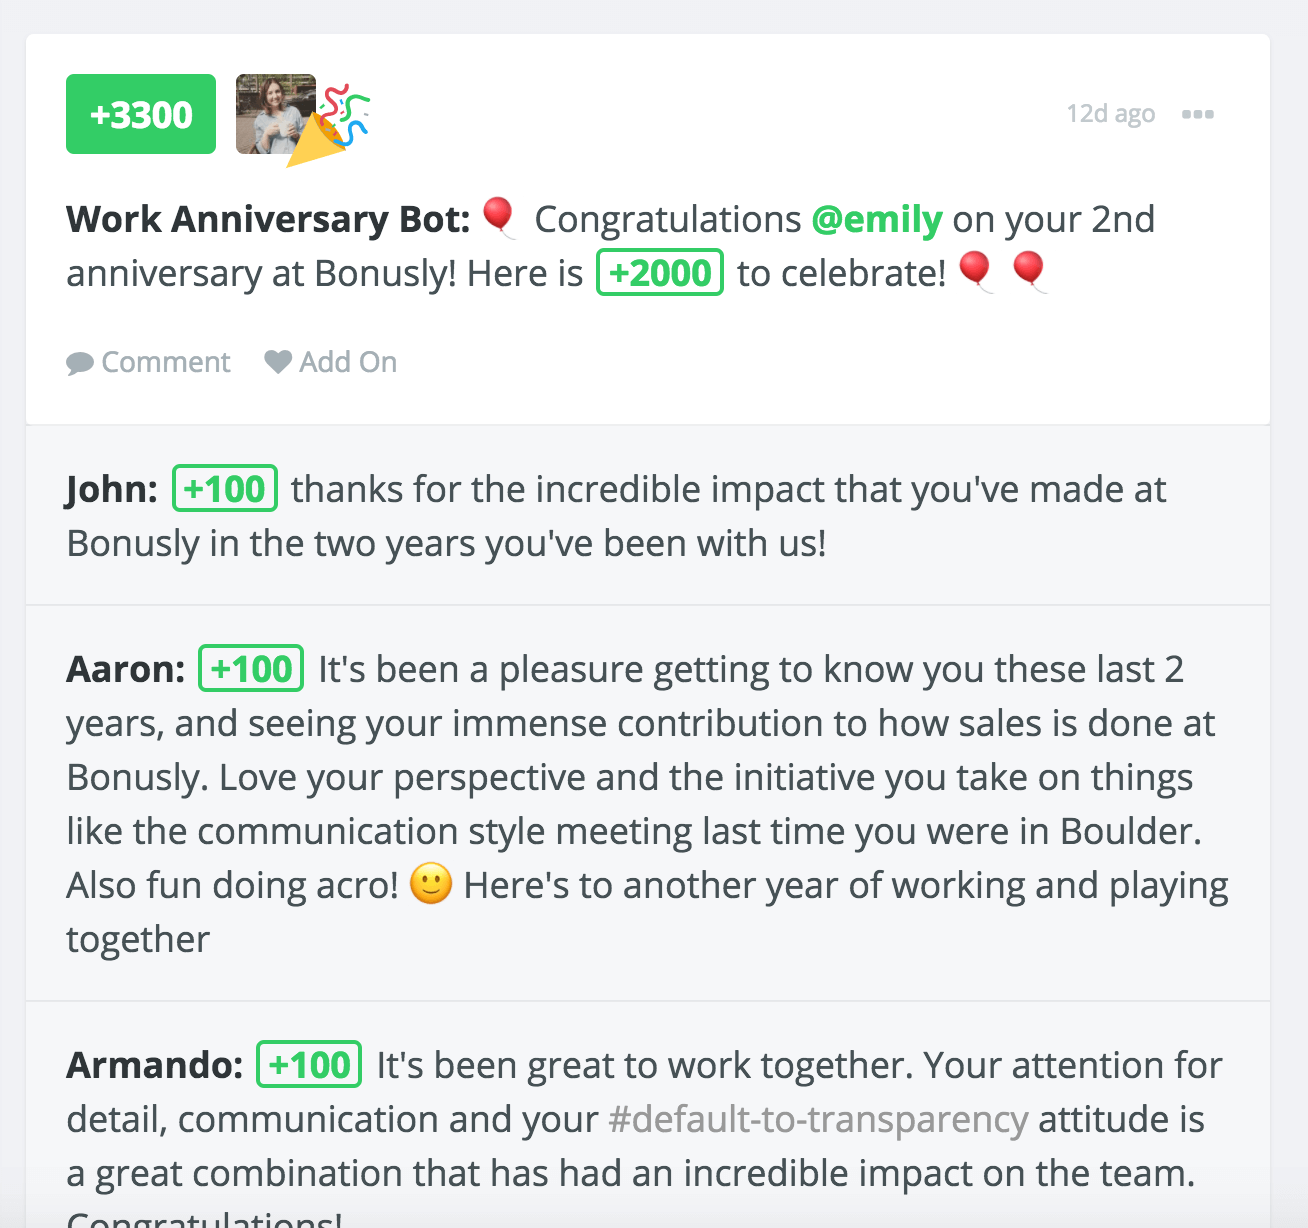 bonusly-work-anniversary